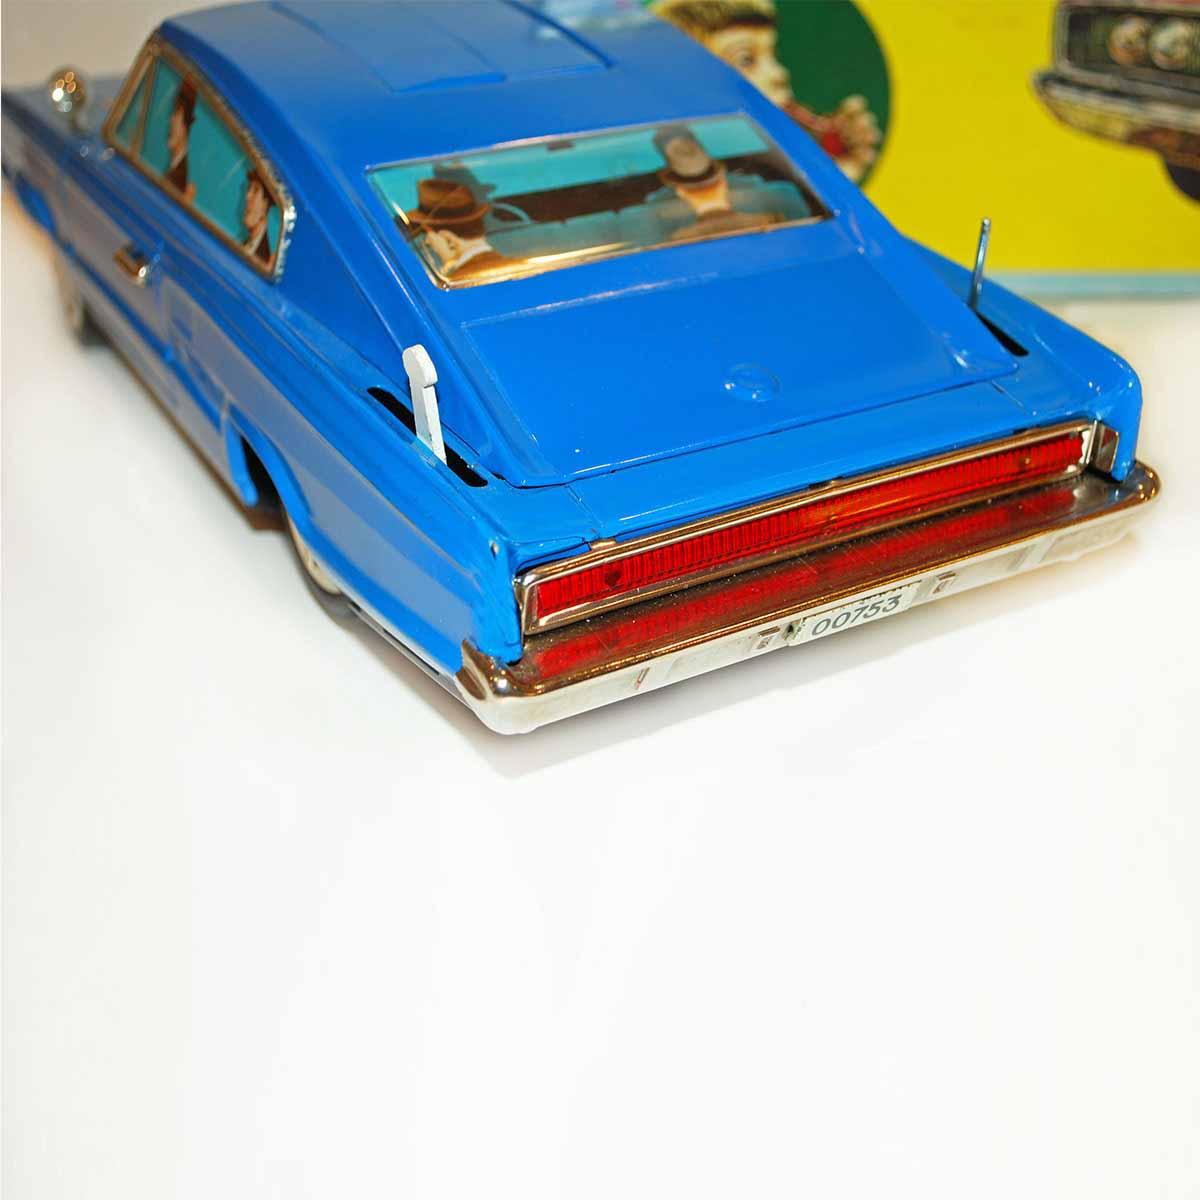 TN/Nomura/Baravelli Sonic Car Dodge Charger Battery Operated MIB